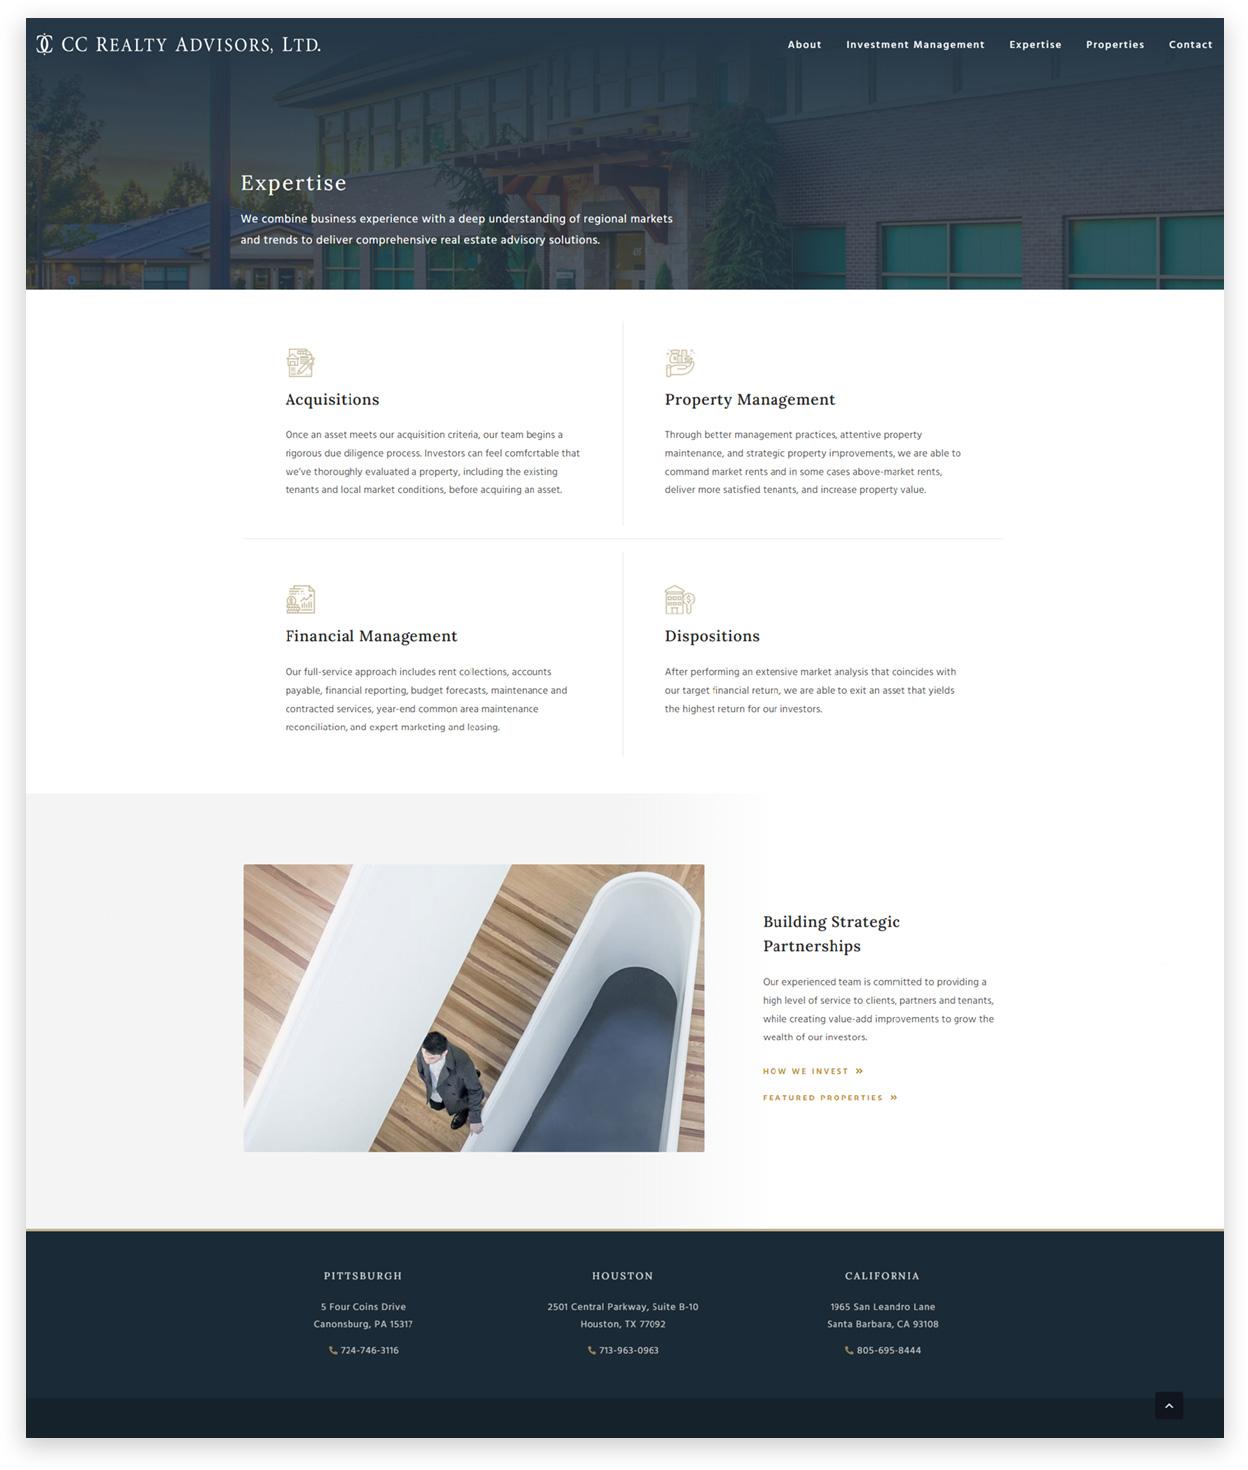 Real Estate Advisory web design